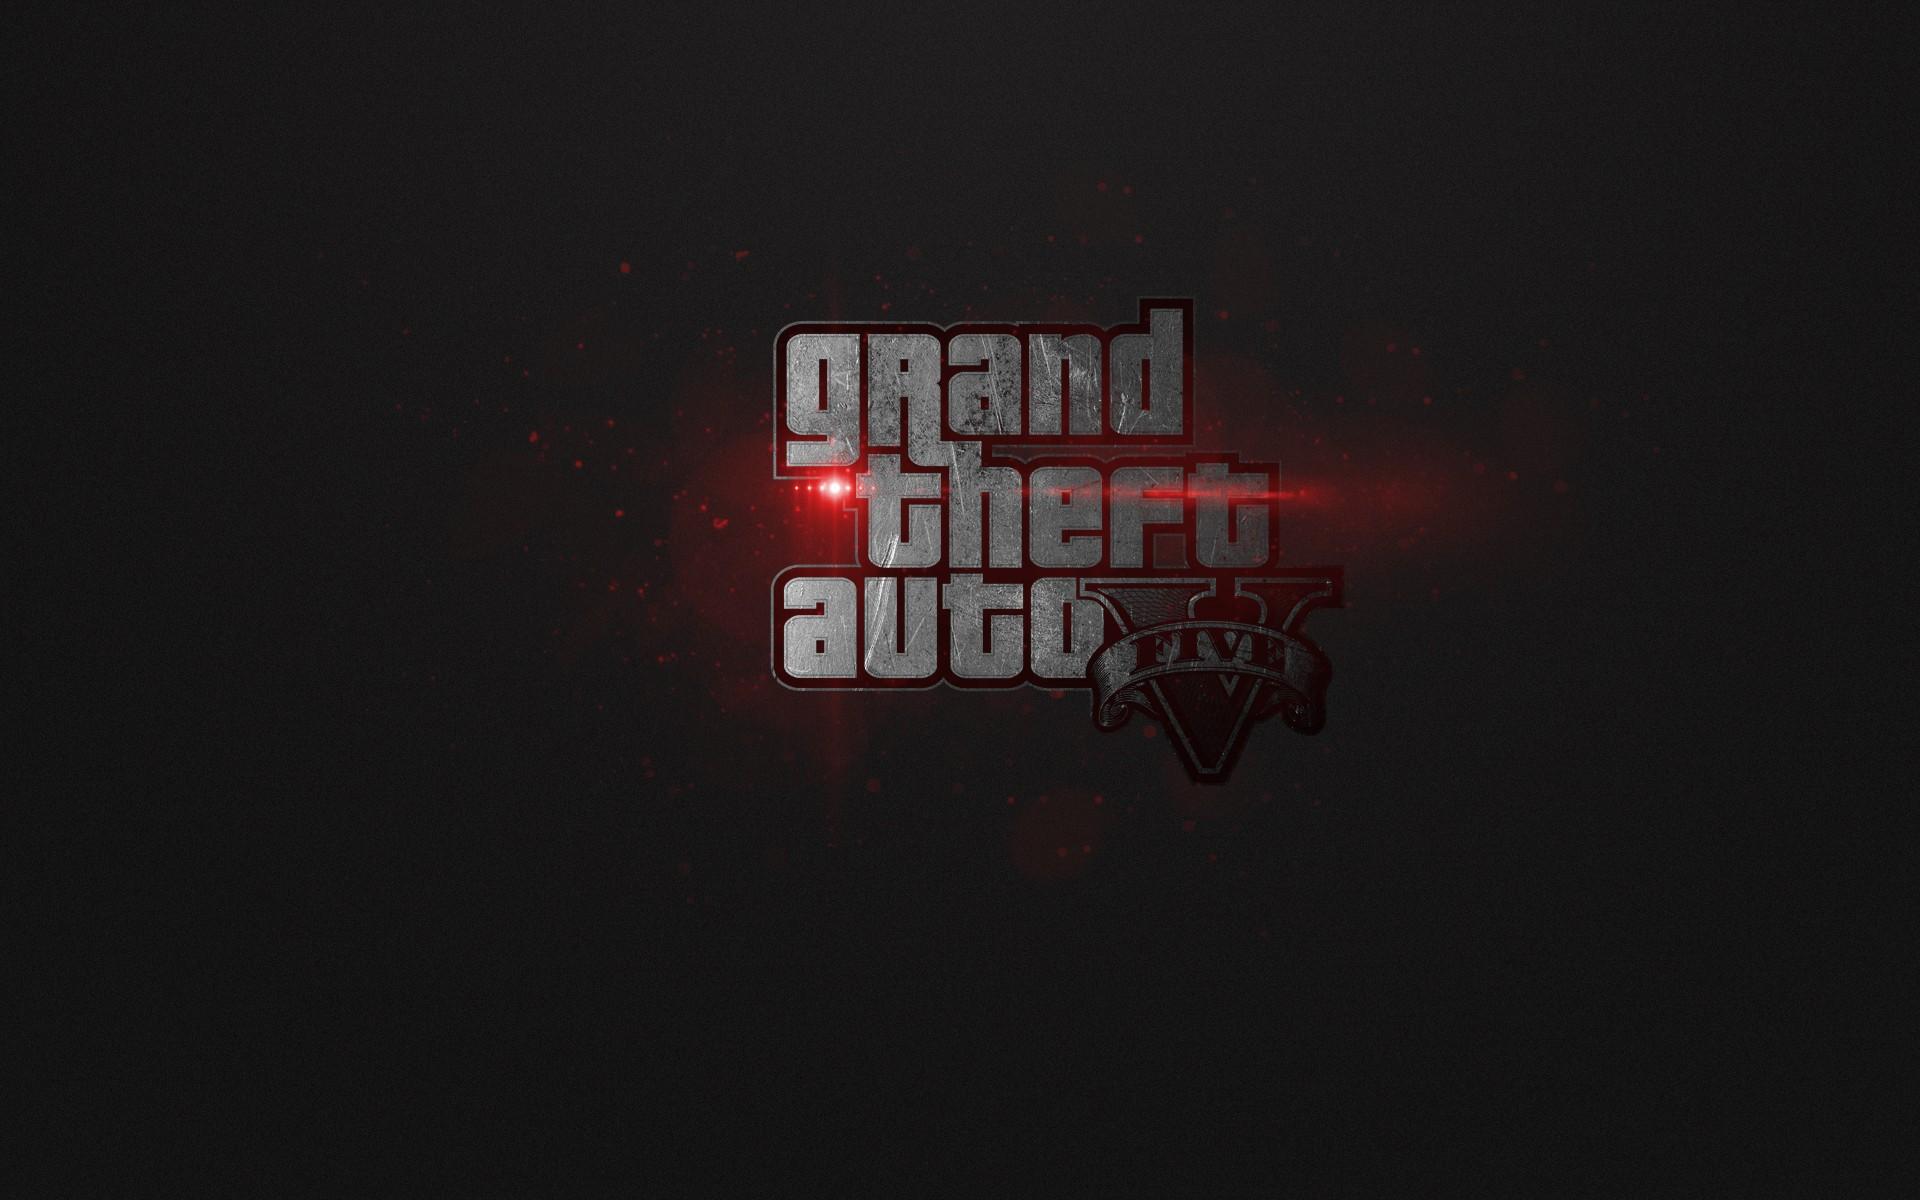 [48+] GTA V Wallpapers 1080p on WallpaperSafari